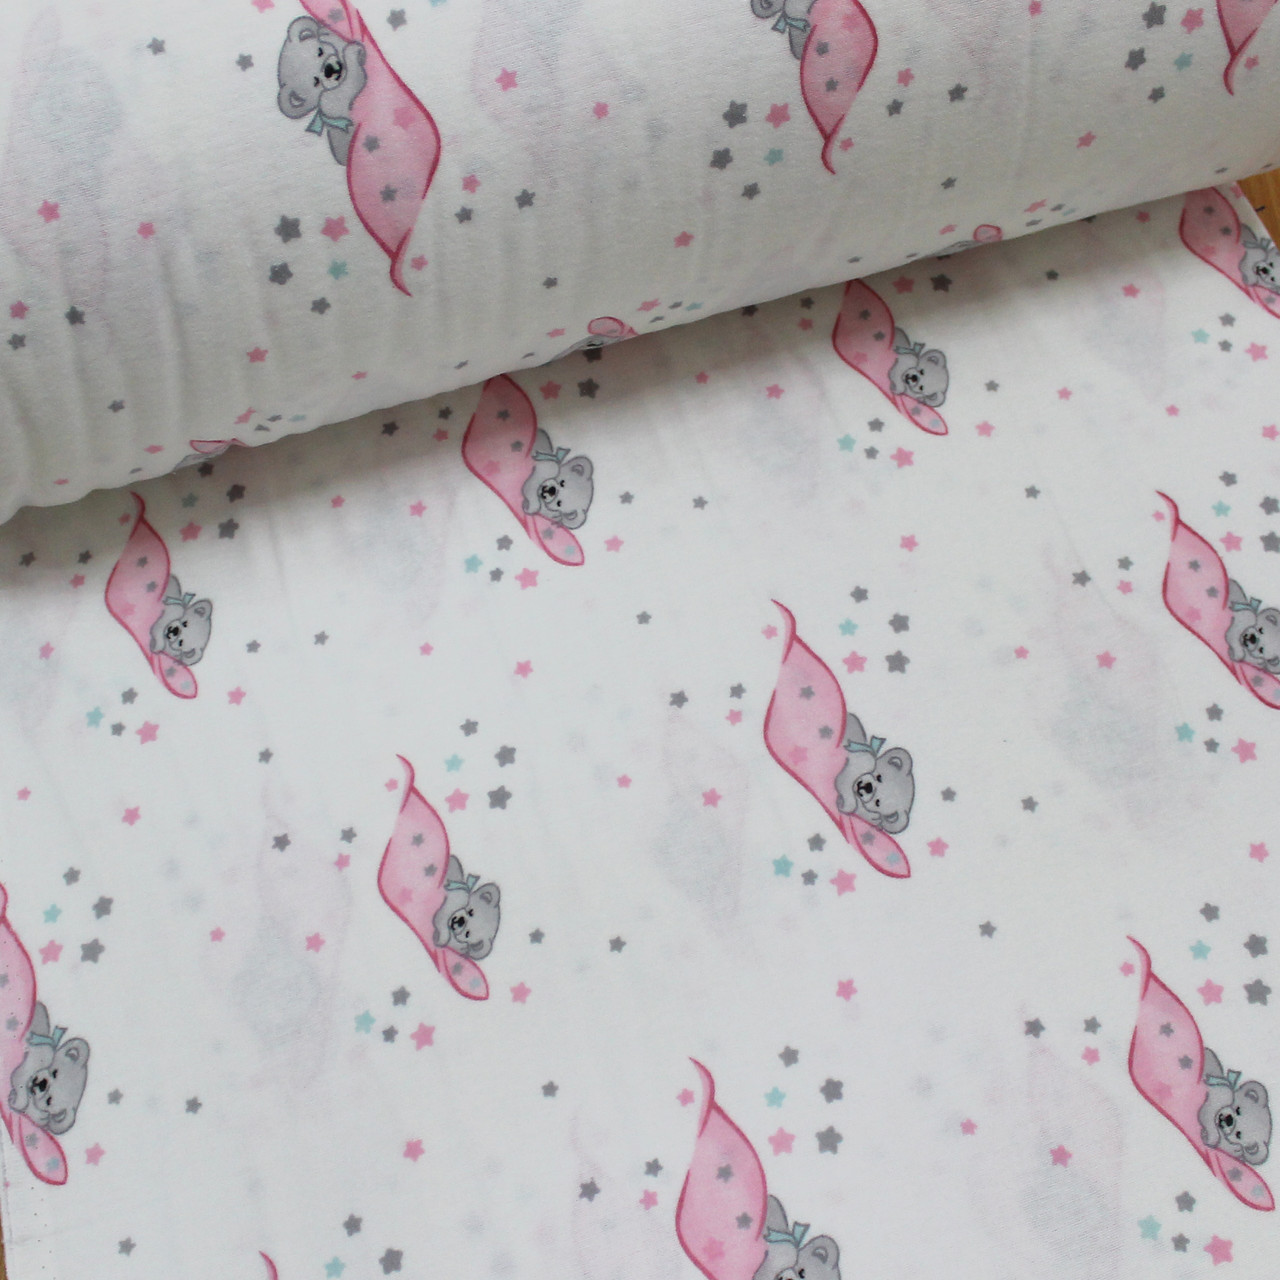 Фланелевая ткань (ТУРЦИЯ шир. 2,4) мишки на розовом одеяле